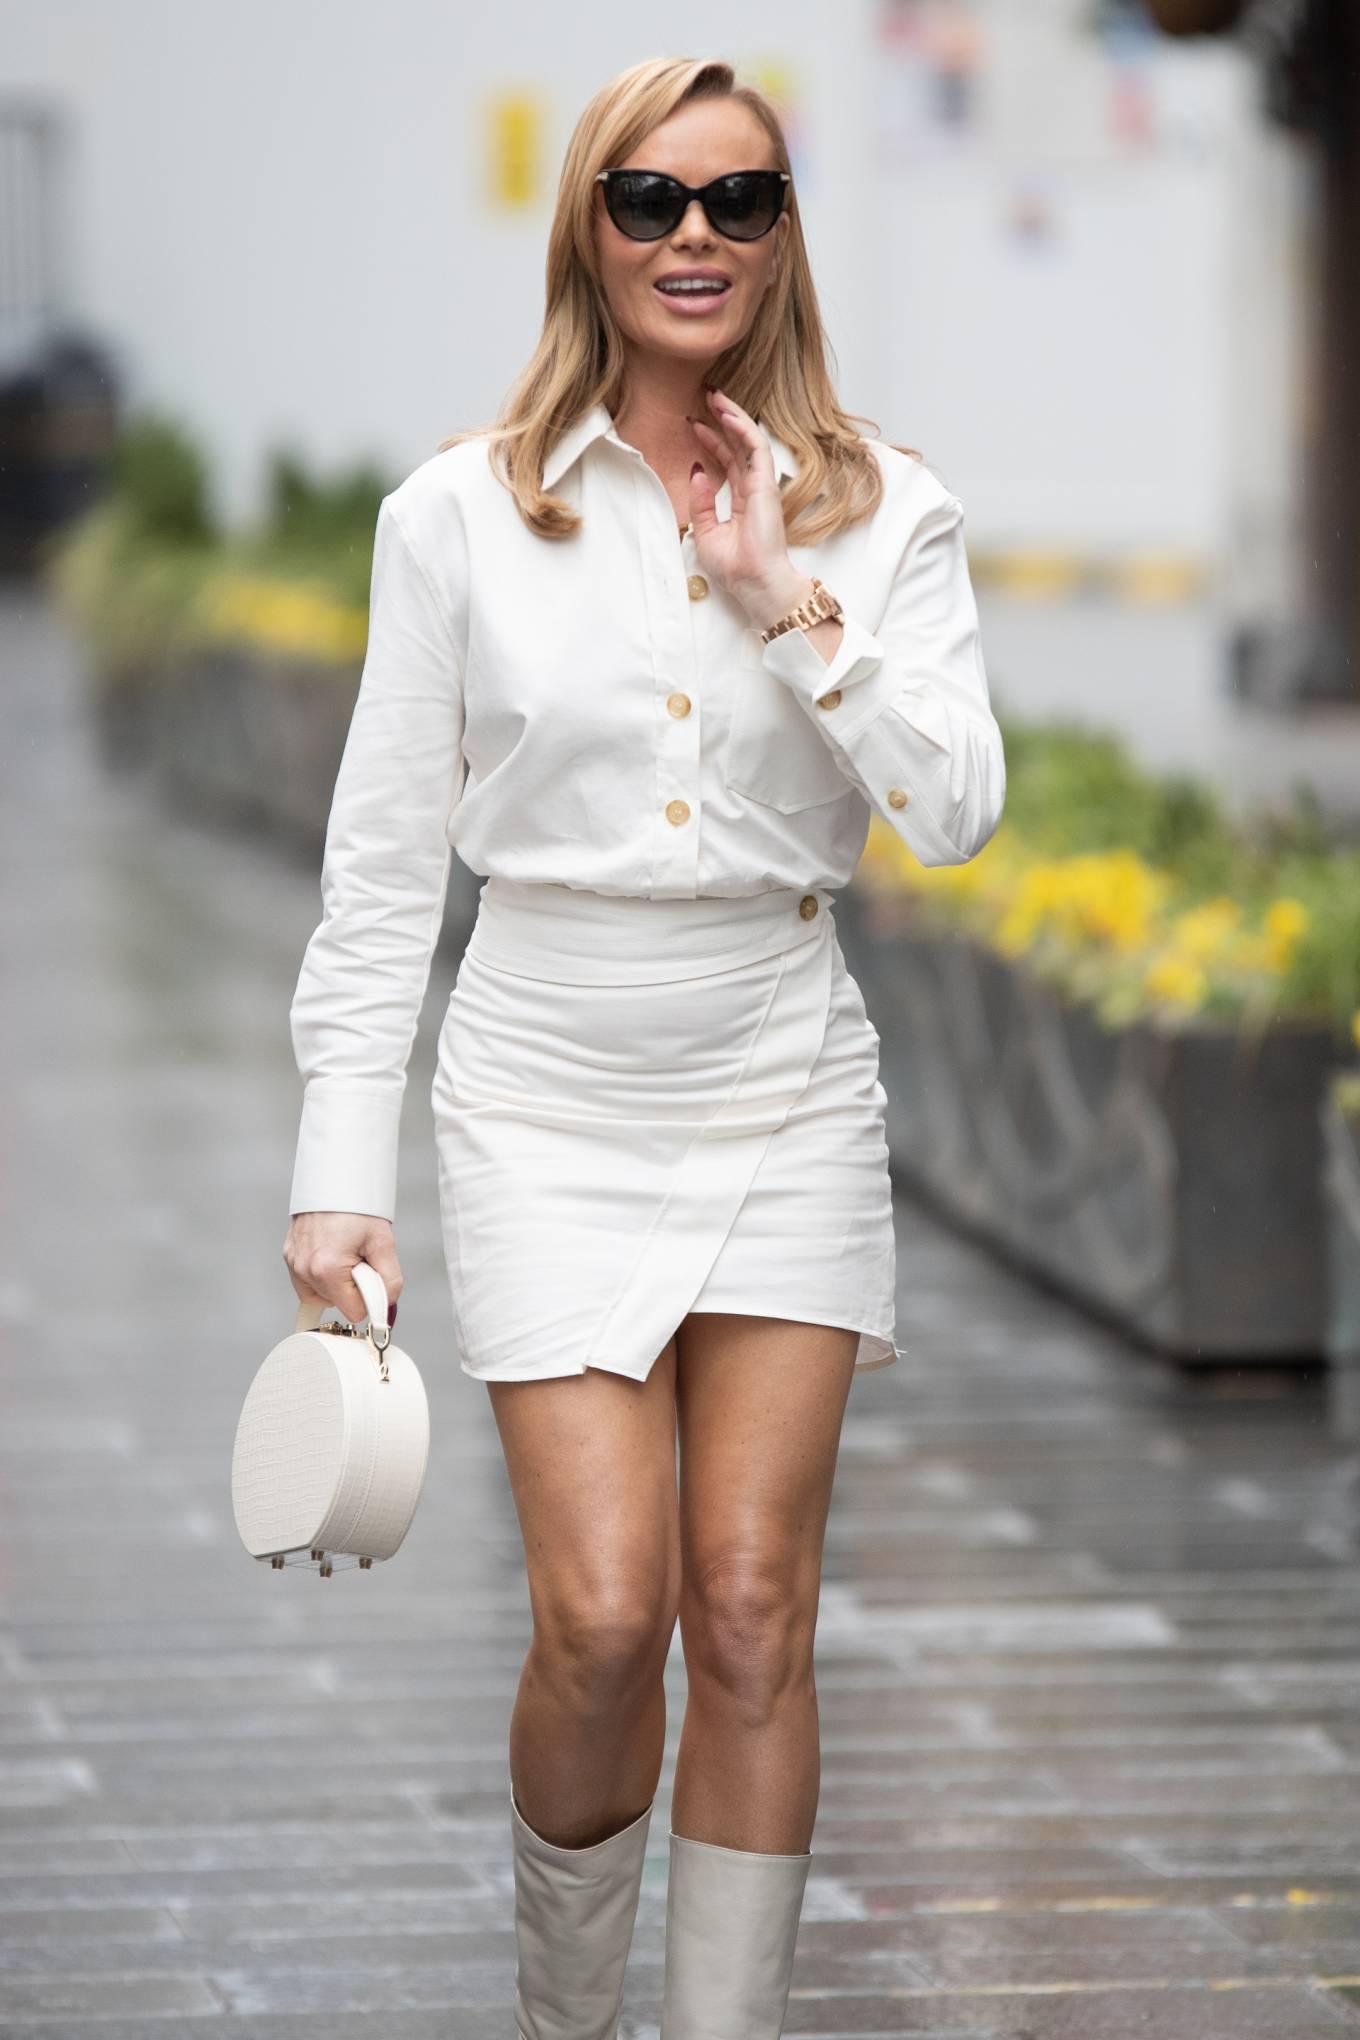 Amanda Holden - In a white miniskirt at Heart Radio Studio in London